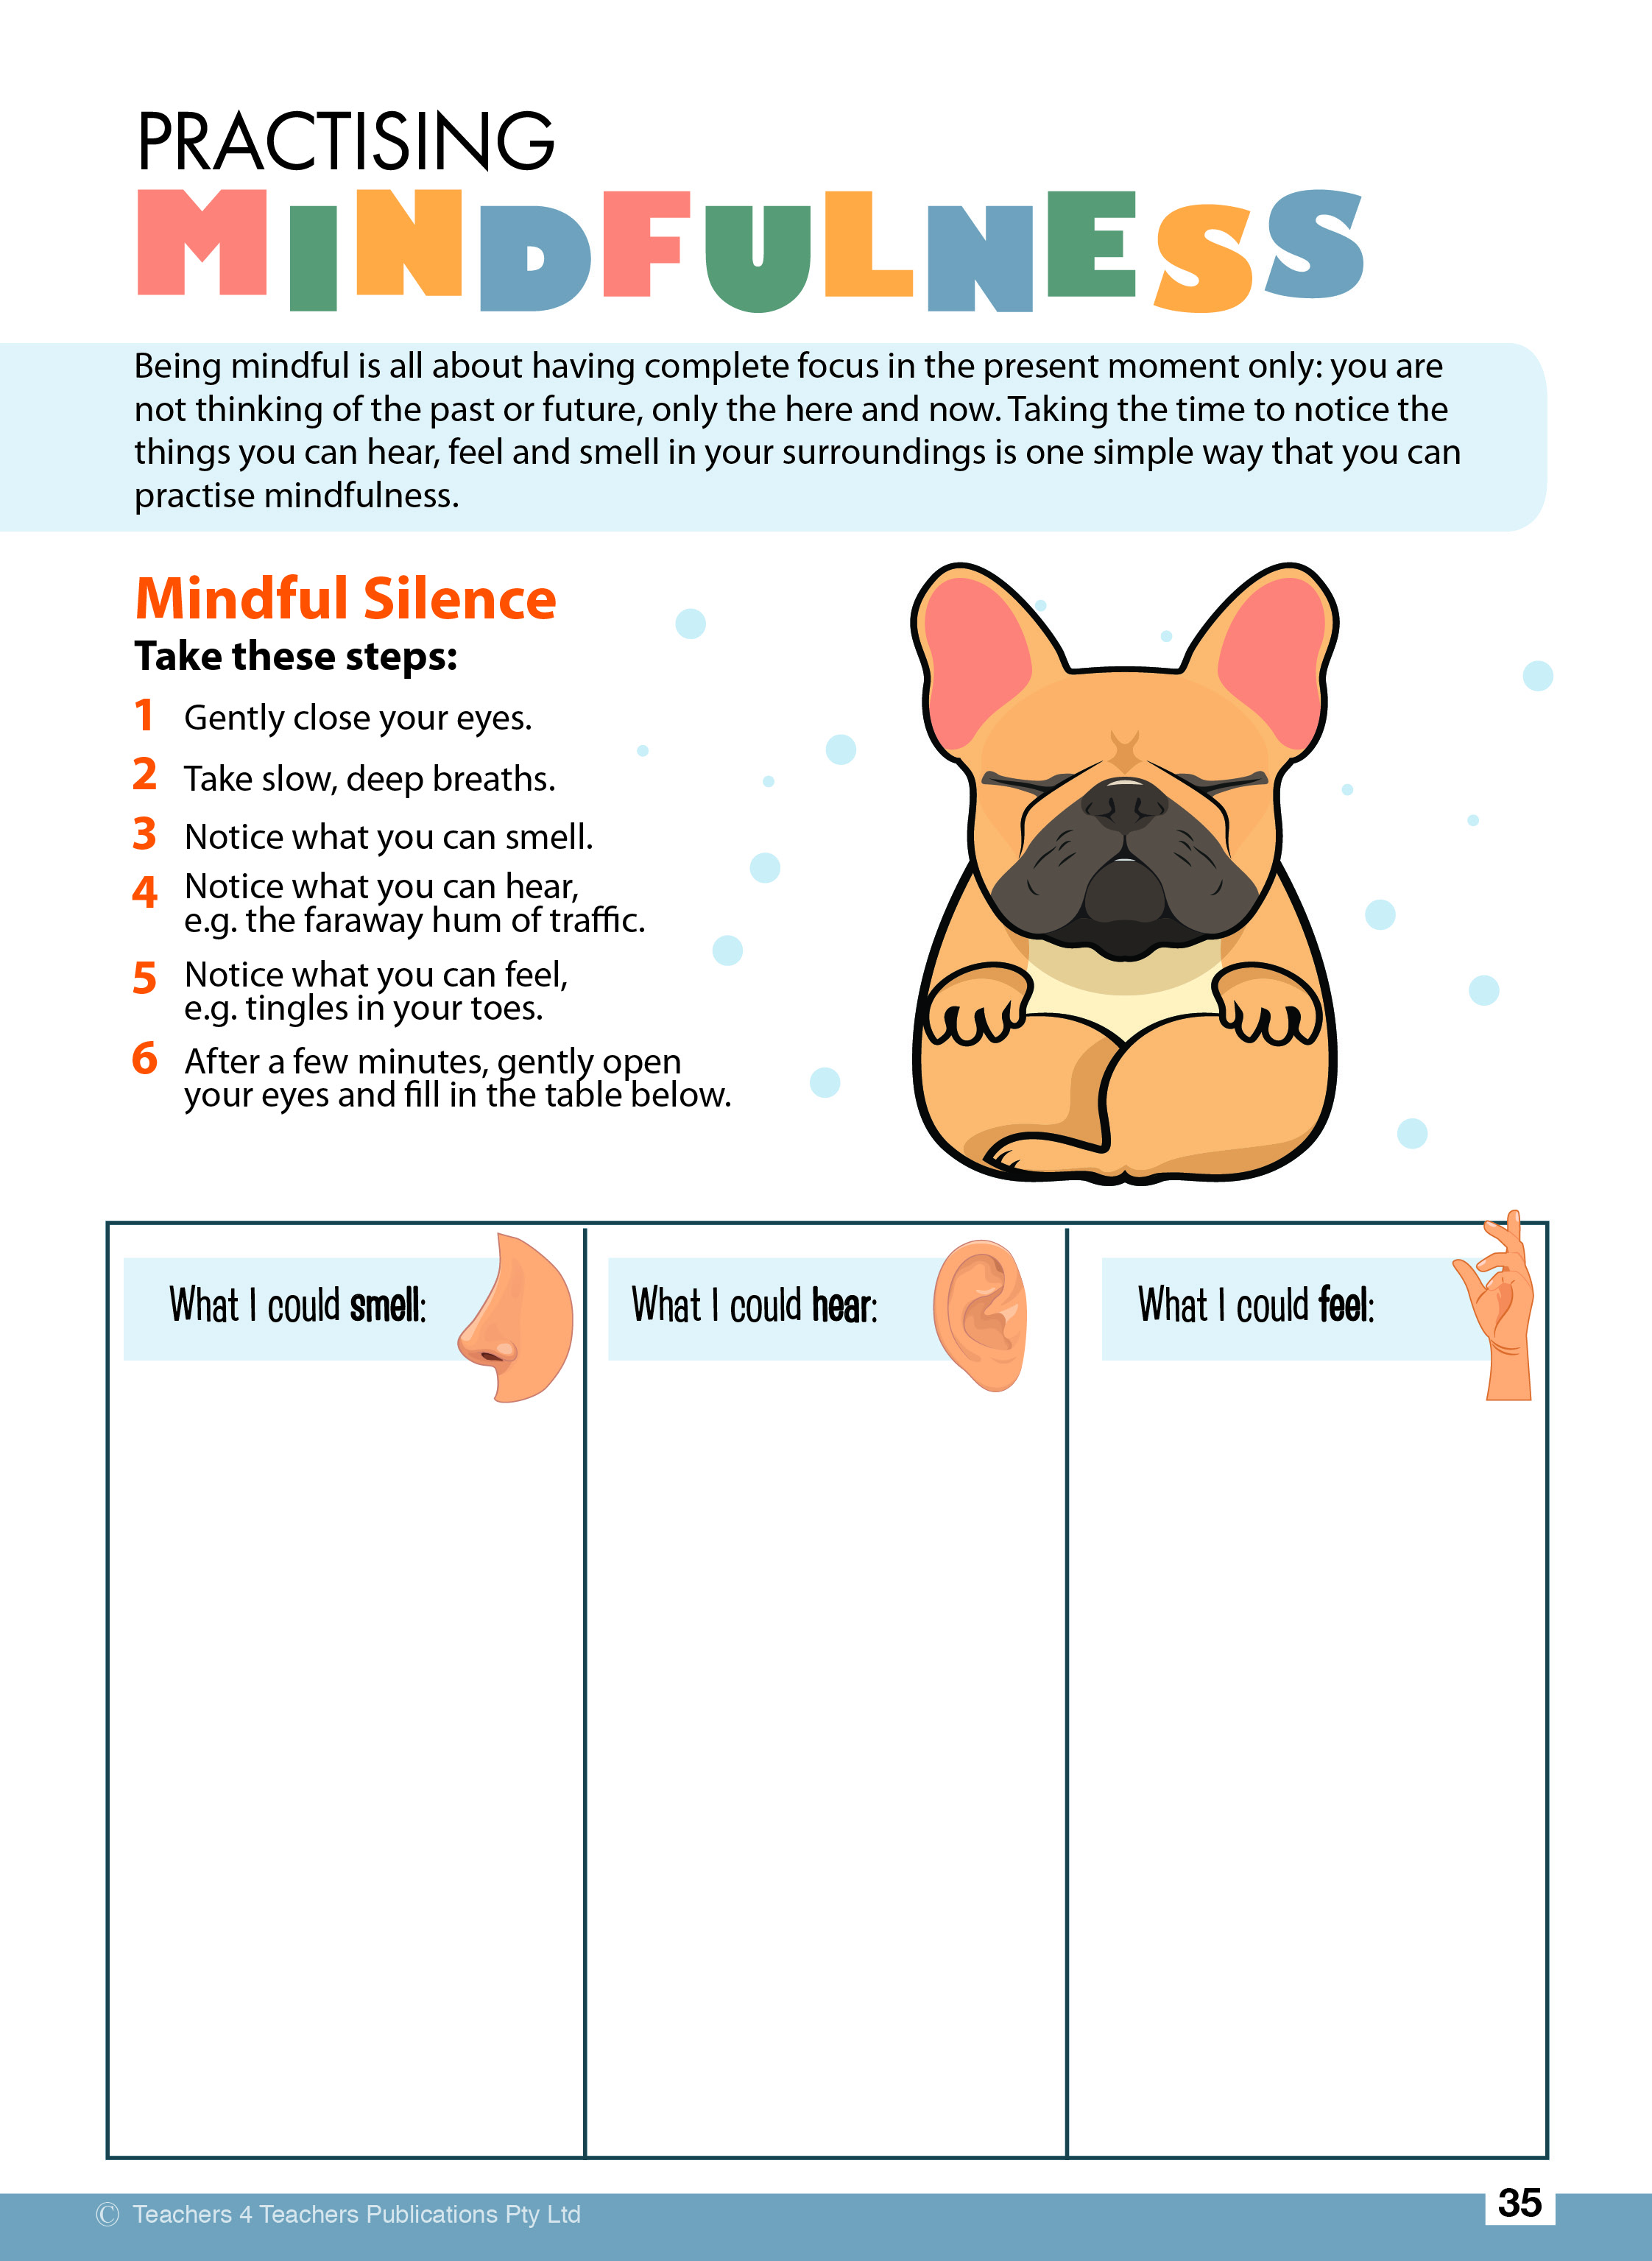 wellbeing-7-8-mindfulness.jpg